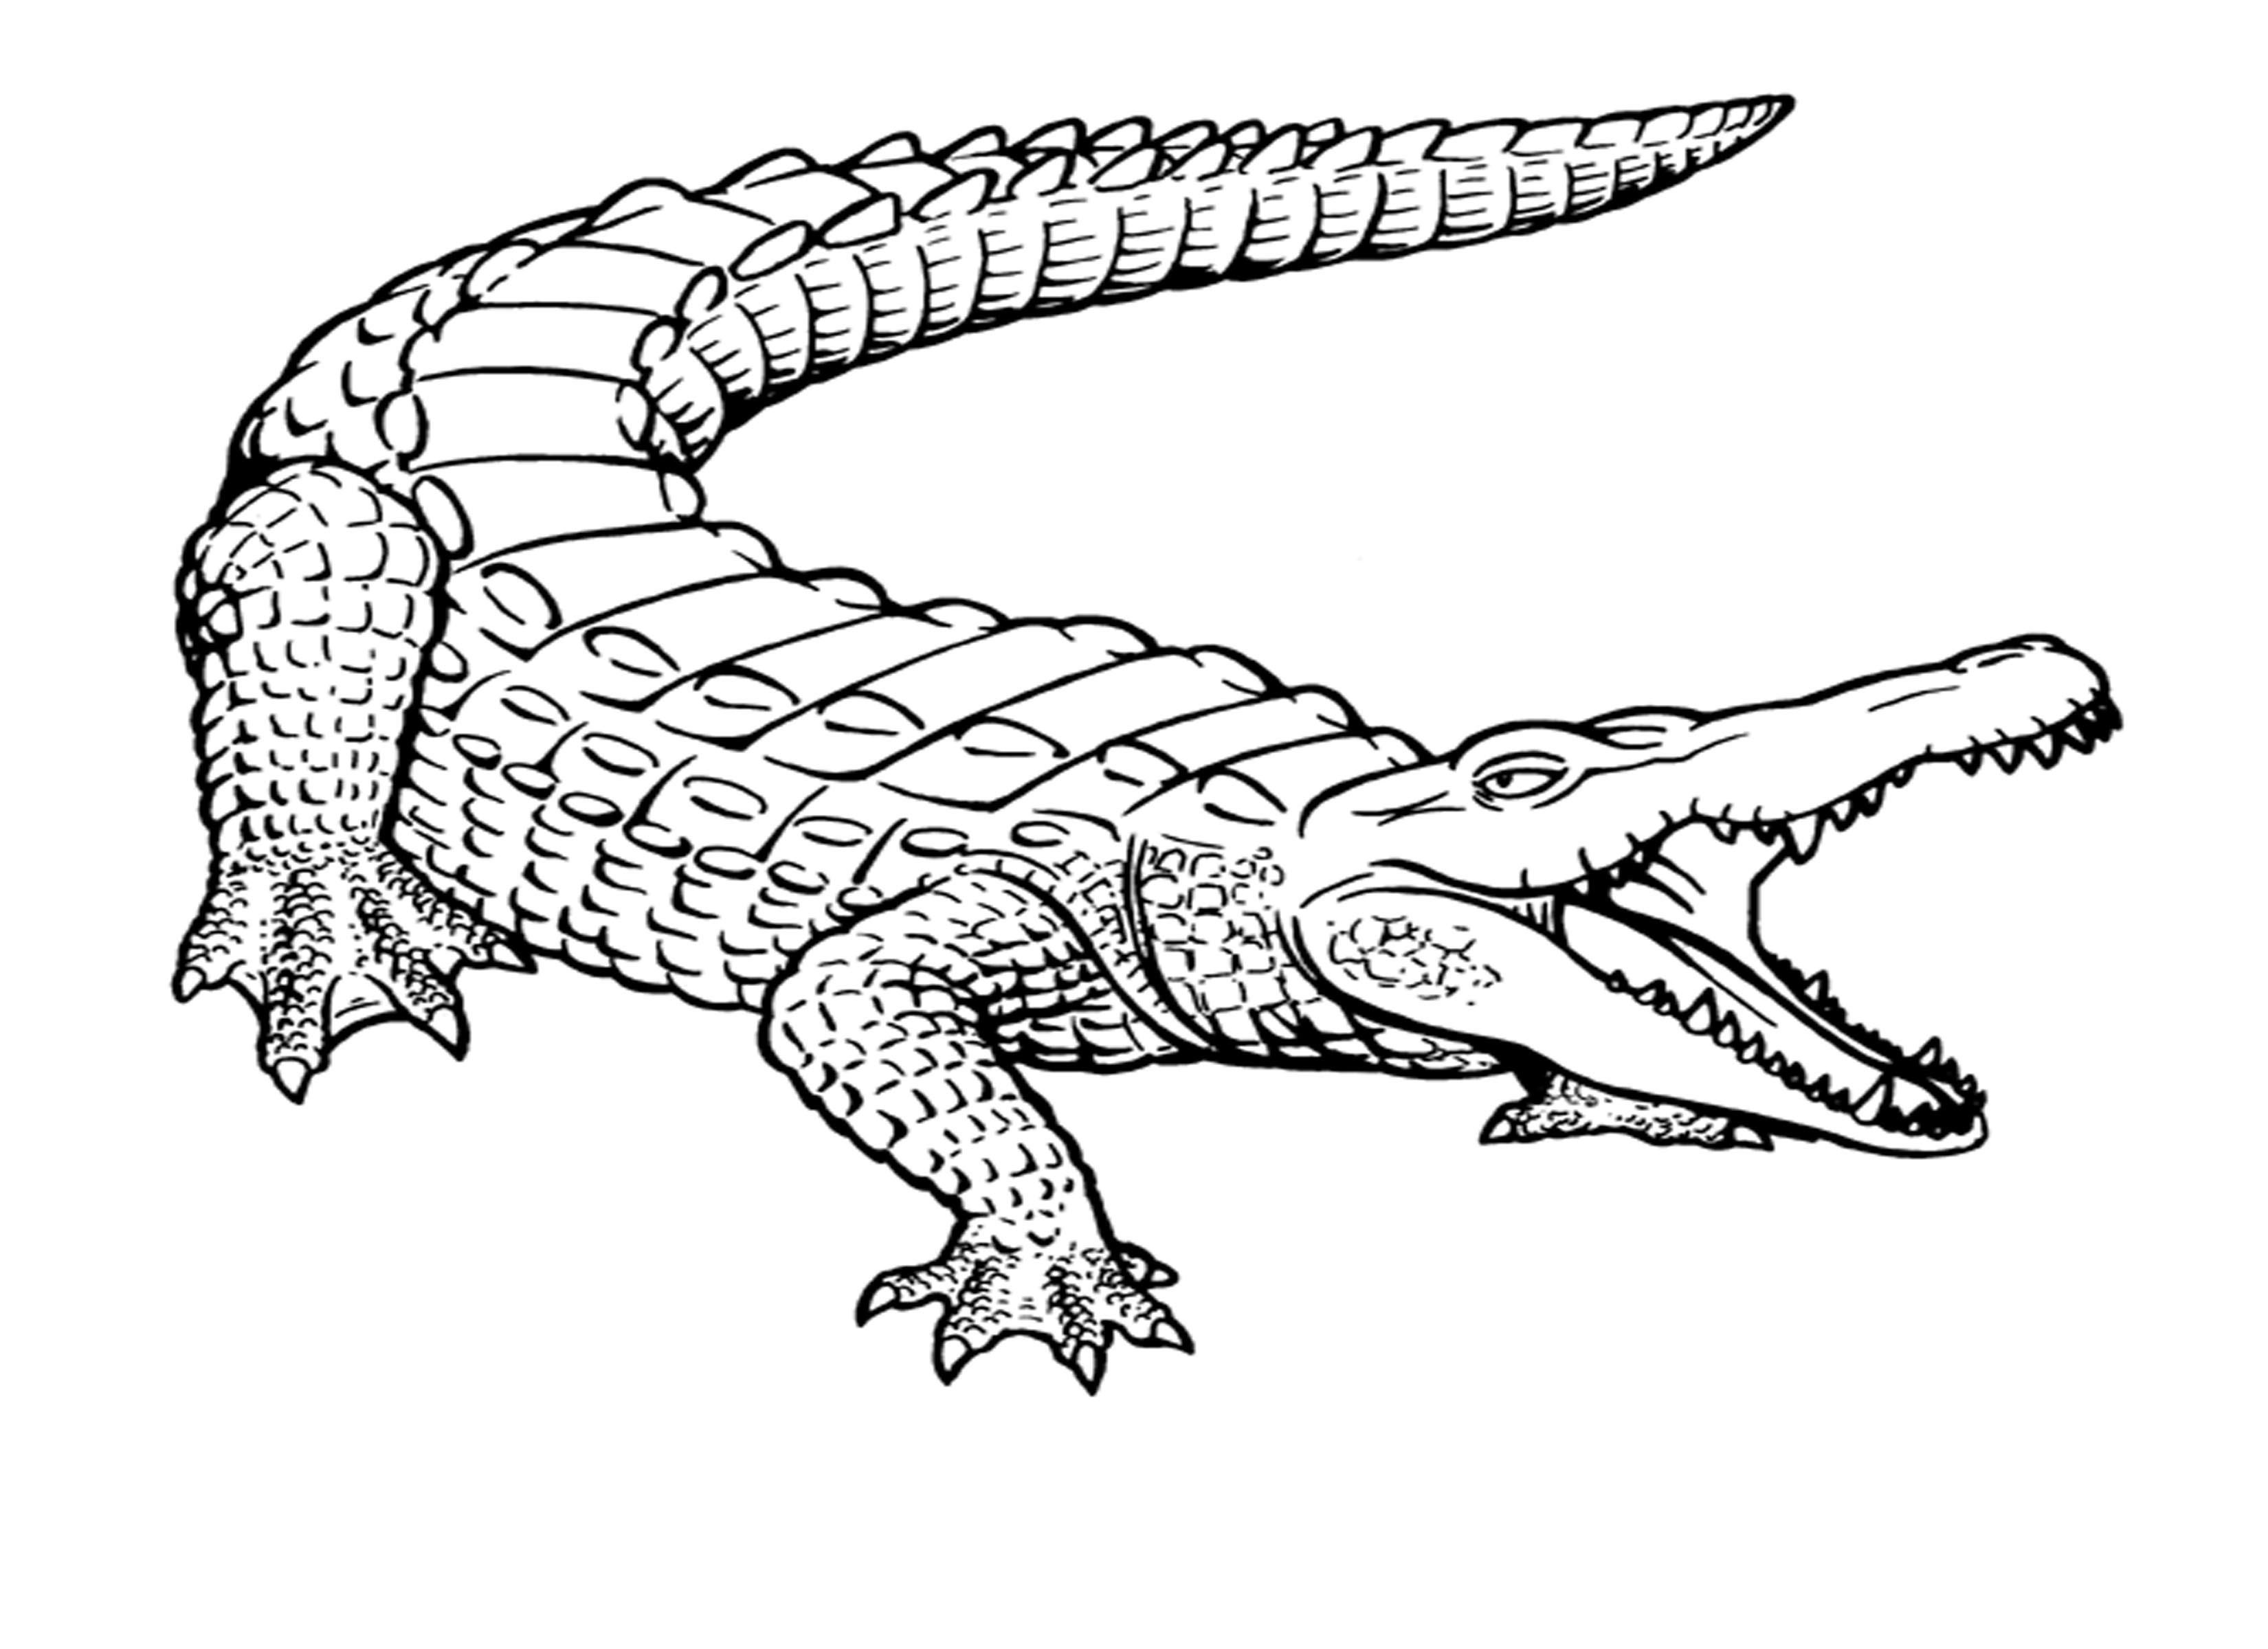 3300x2400 Crocodile Hd Pencil Drawing Images Crocodile Hd Pencil Drawing